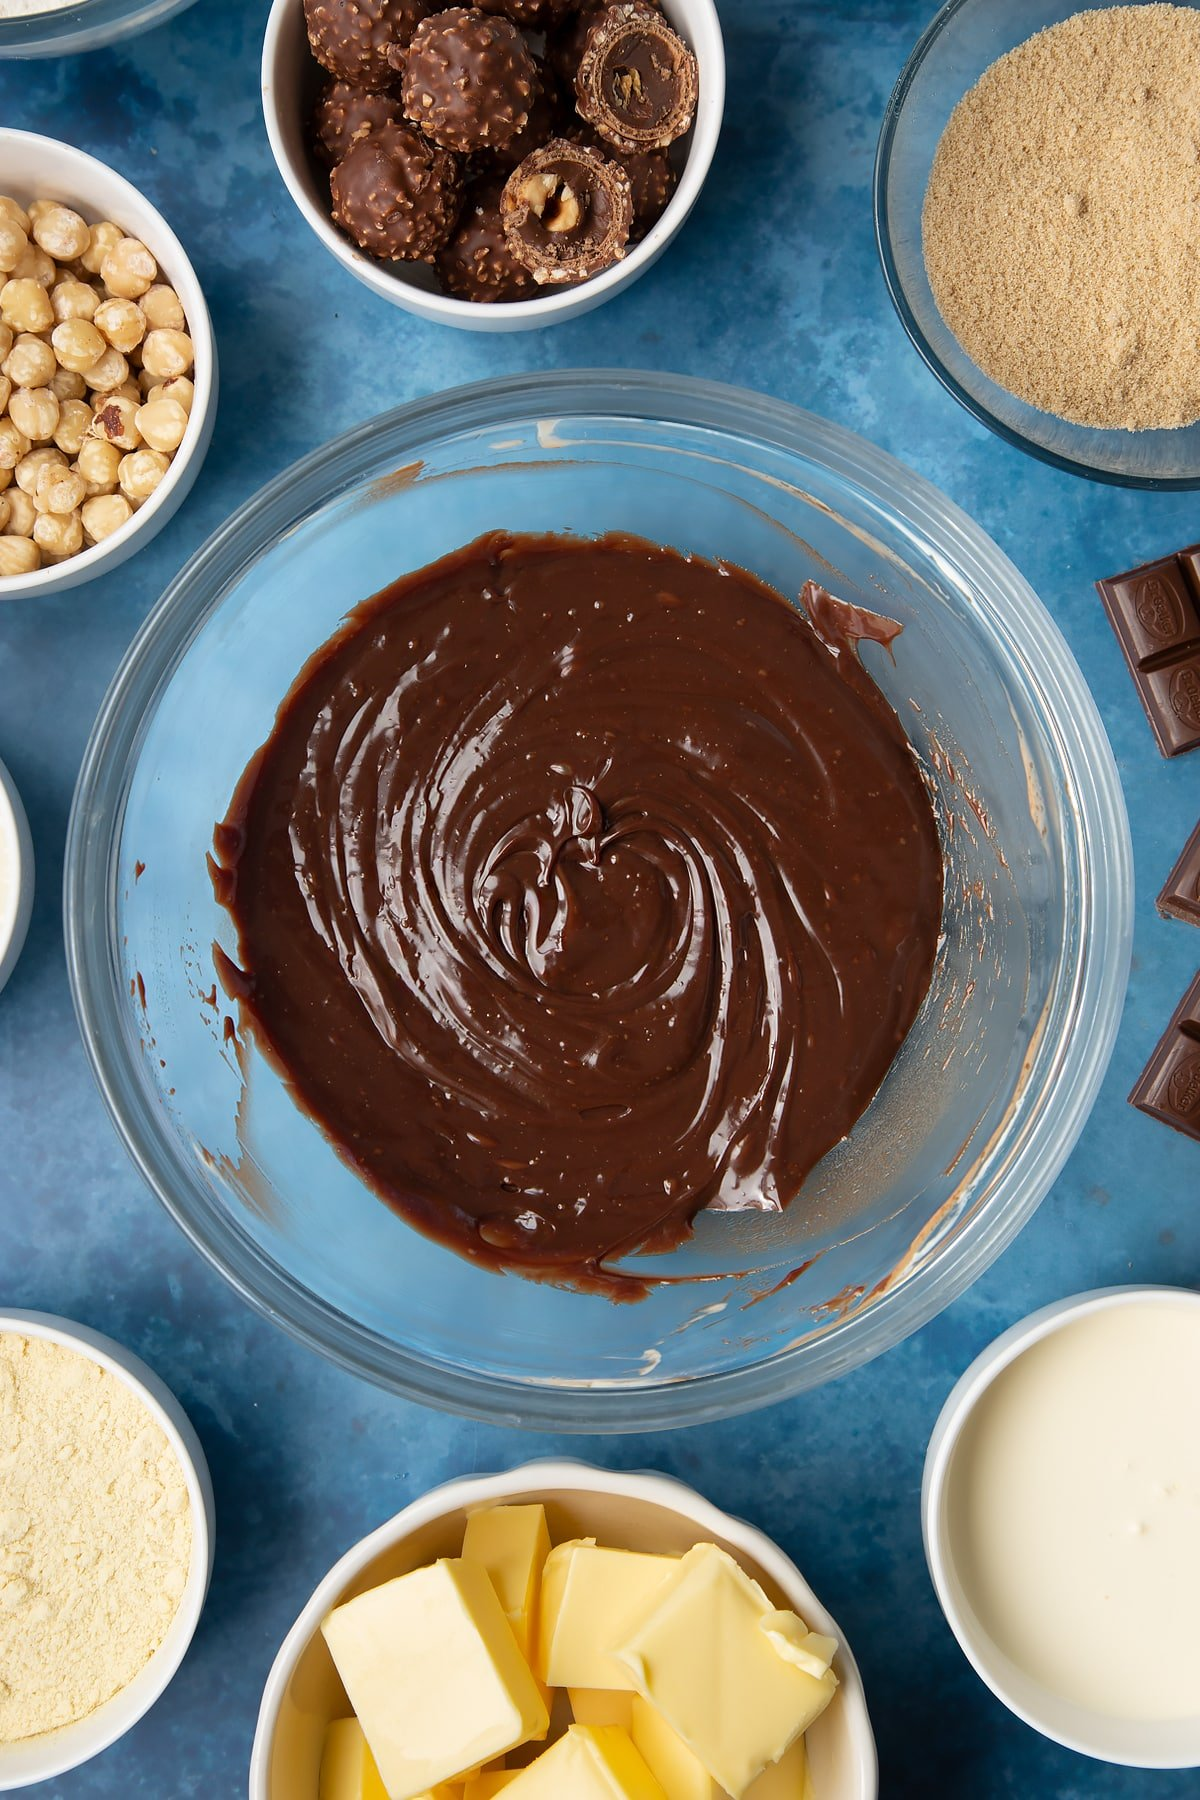 Dark chocolate ganache in a glass mixing bowl. Ingredients to make a Ferrero Rocher slice surround the bowl.